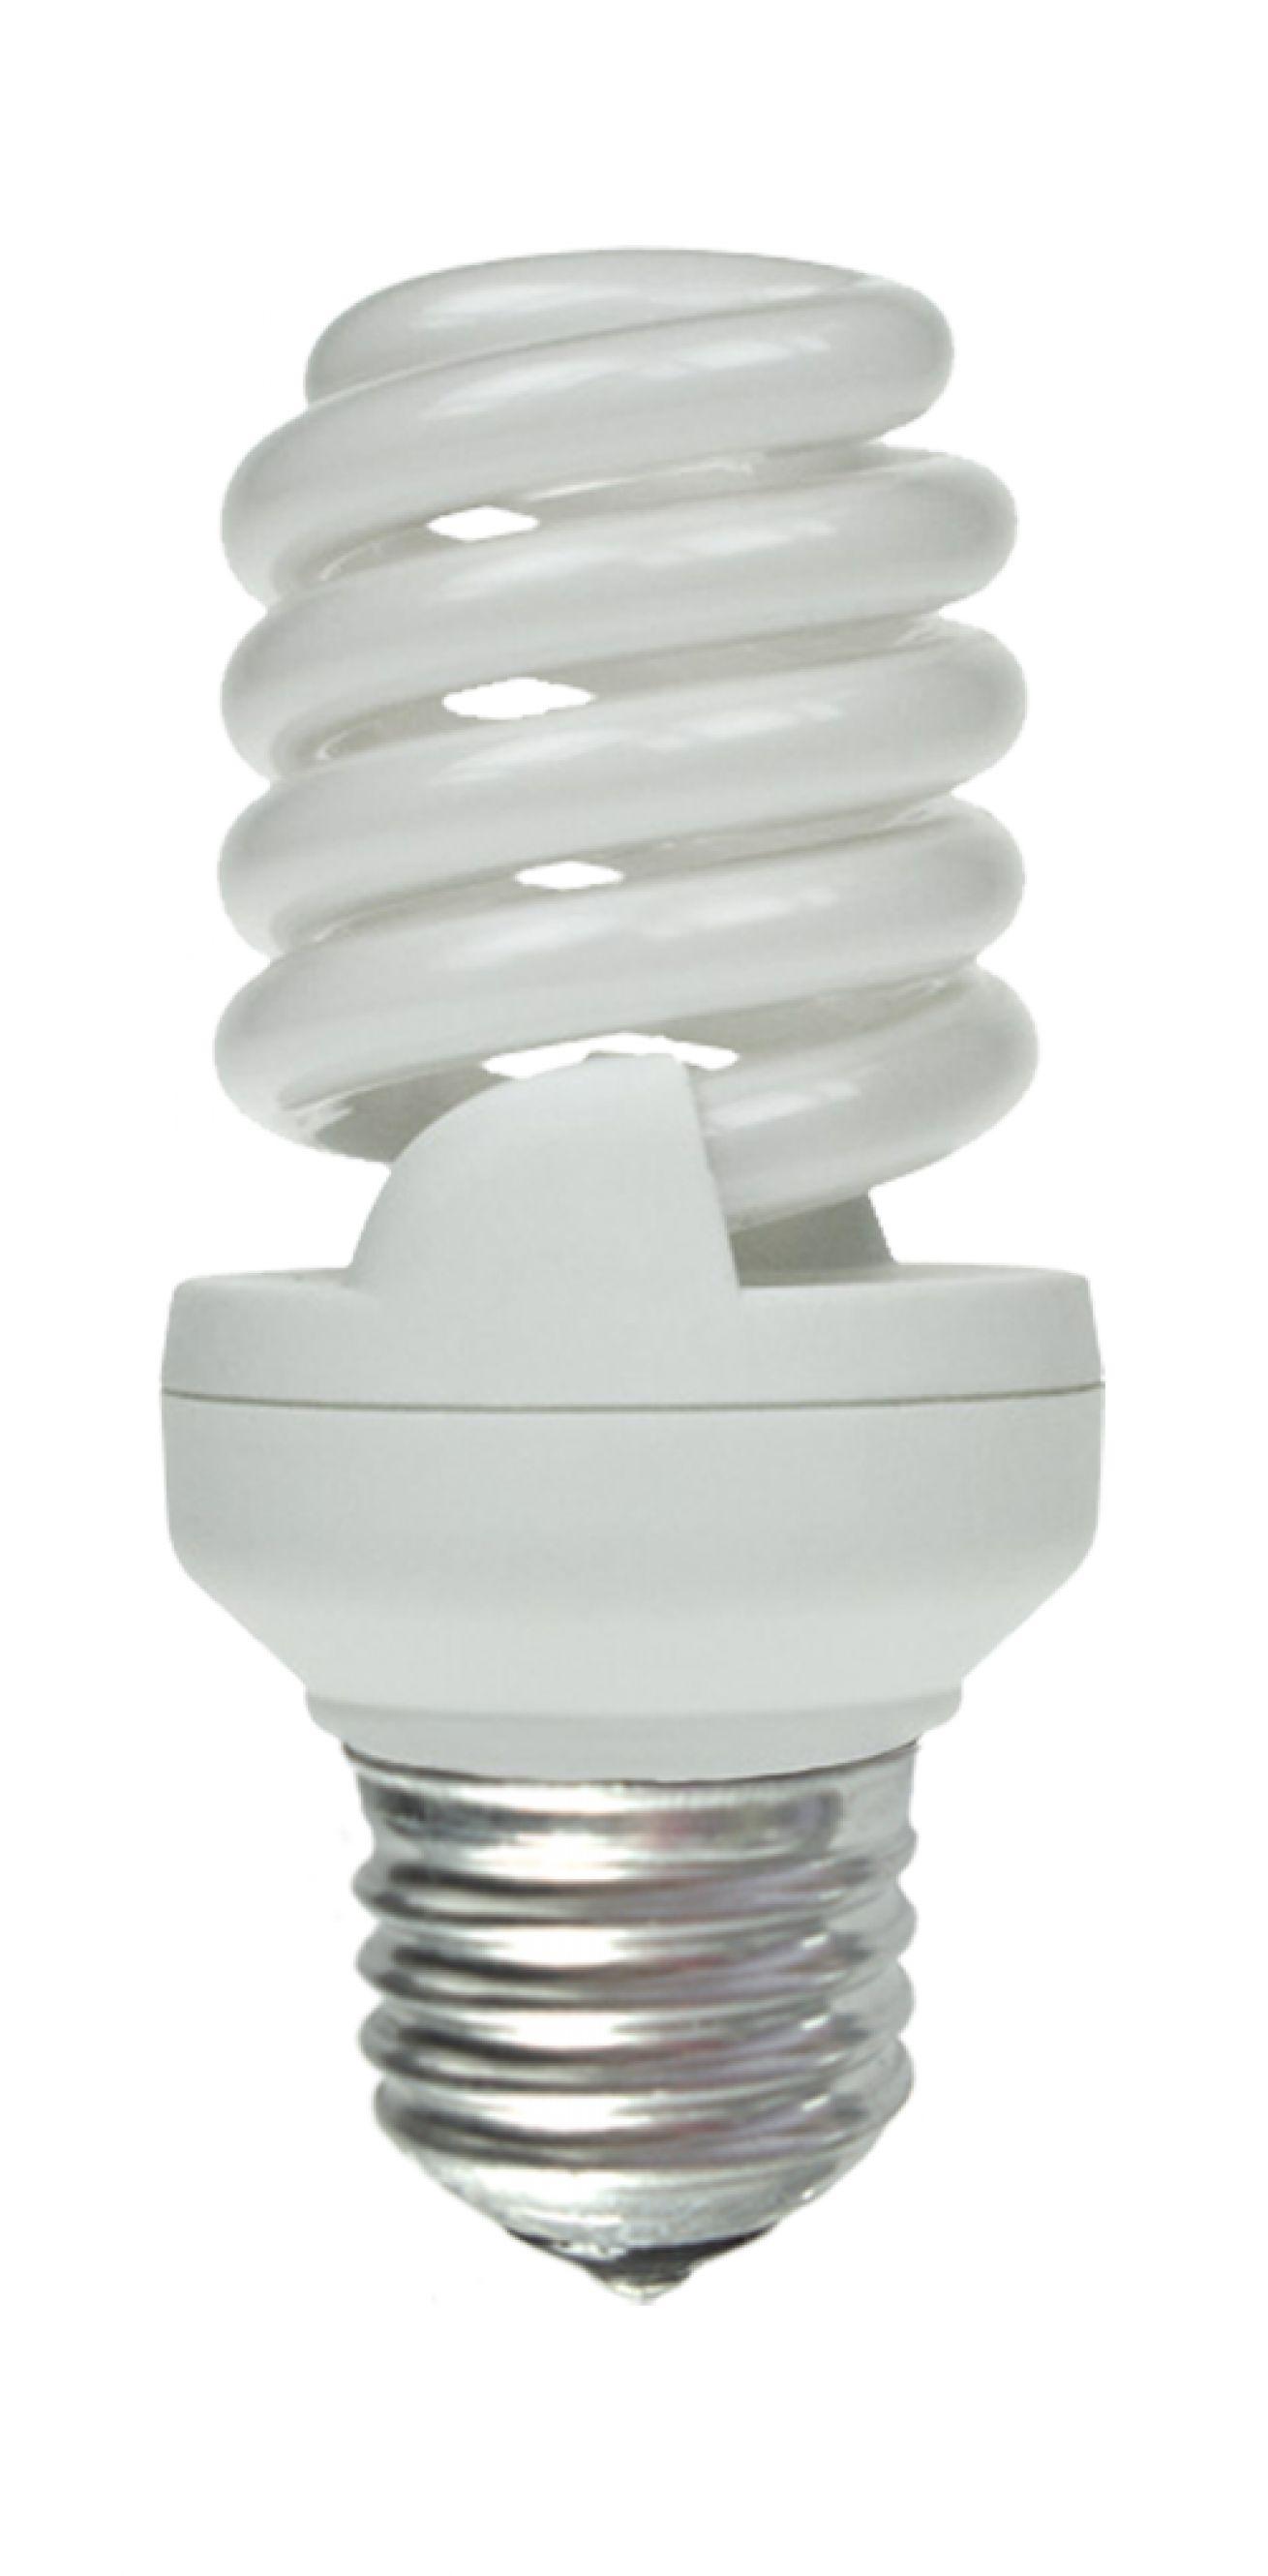 Searchlight 6211 Pir Outdoor Light Fitting Lantern